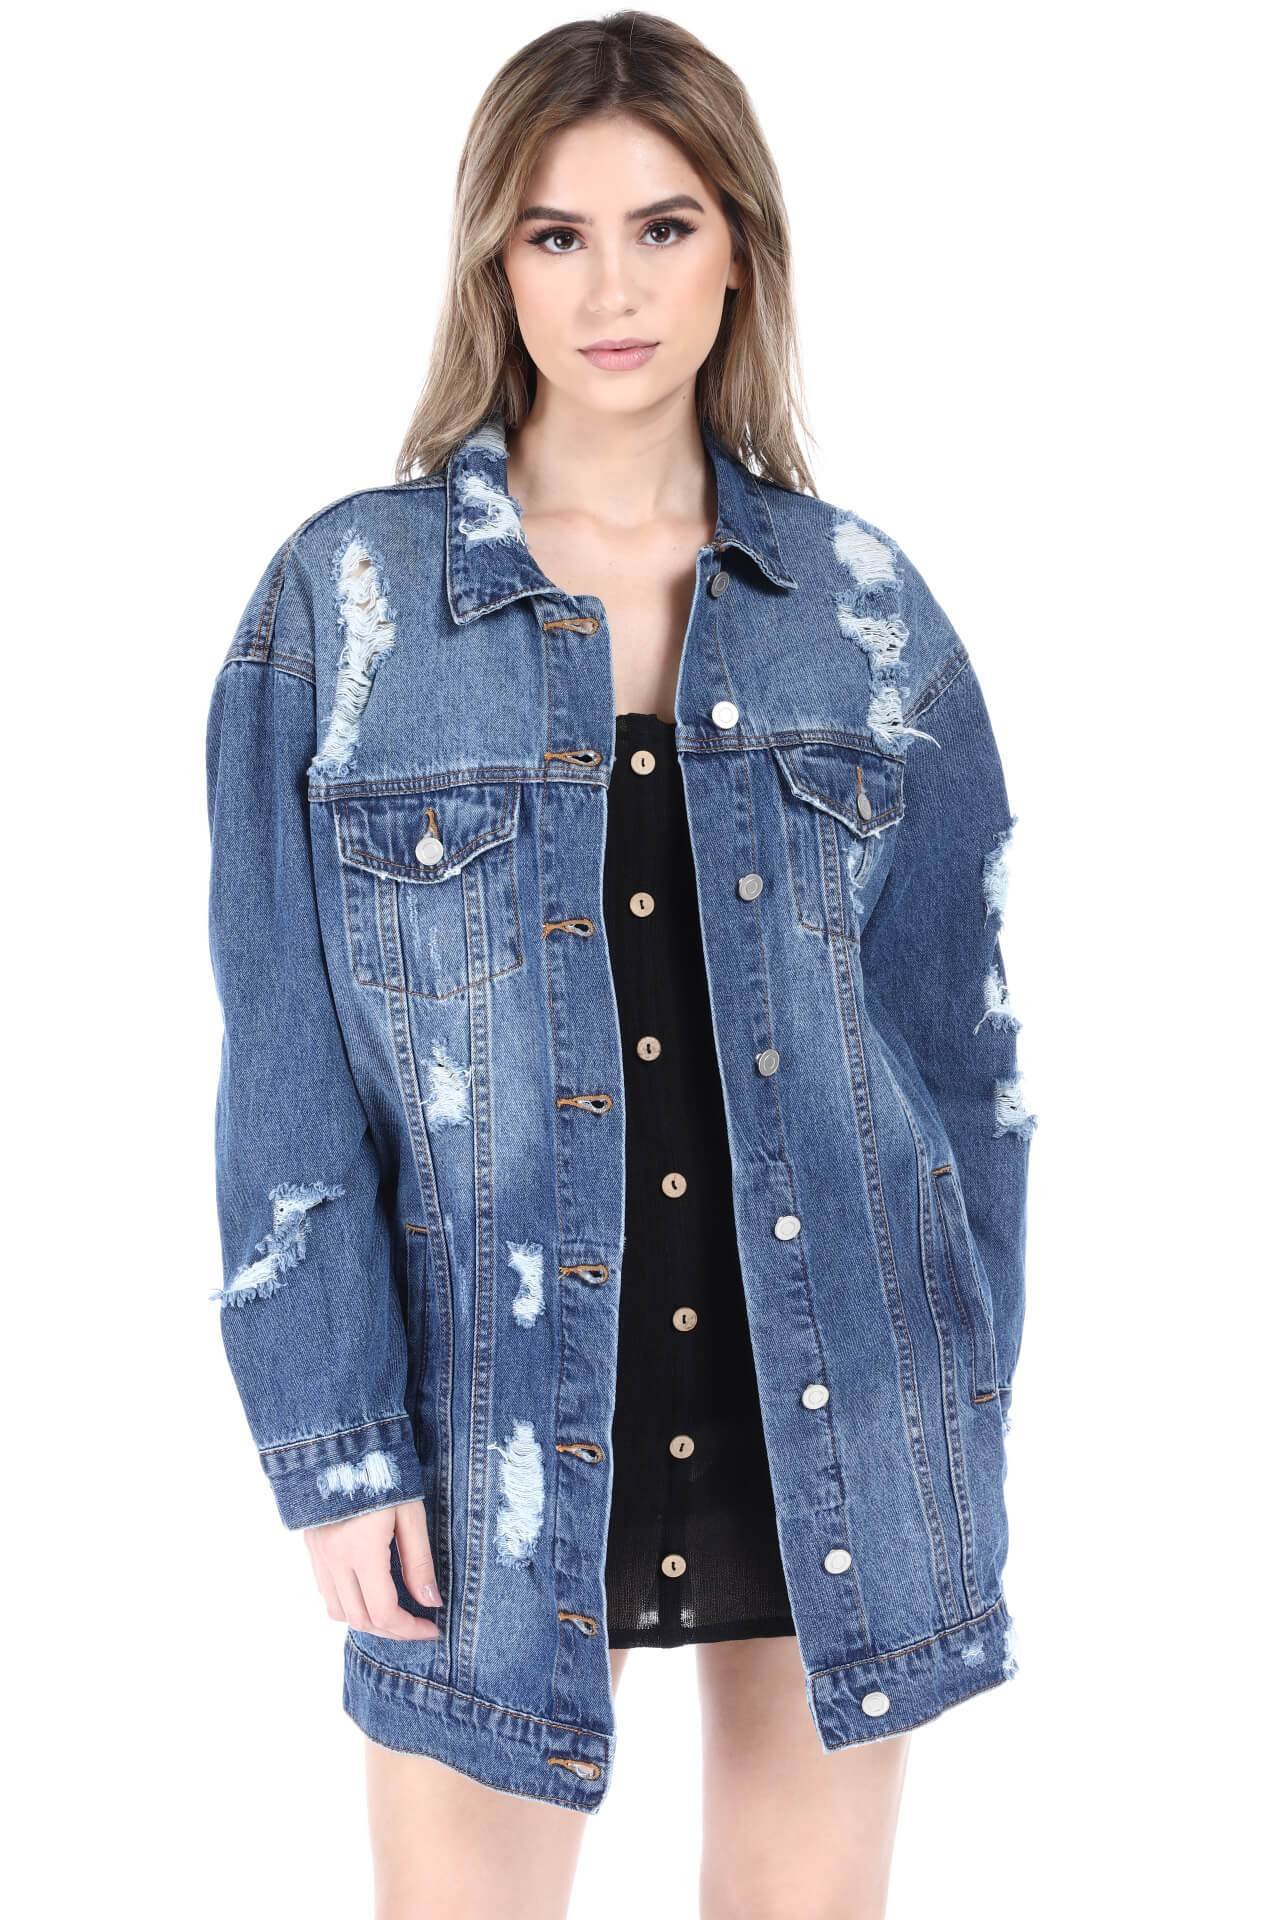 SALT TREE The Blue Jean Women's Destroyed Boyfriend Over Sized Denim Jacket